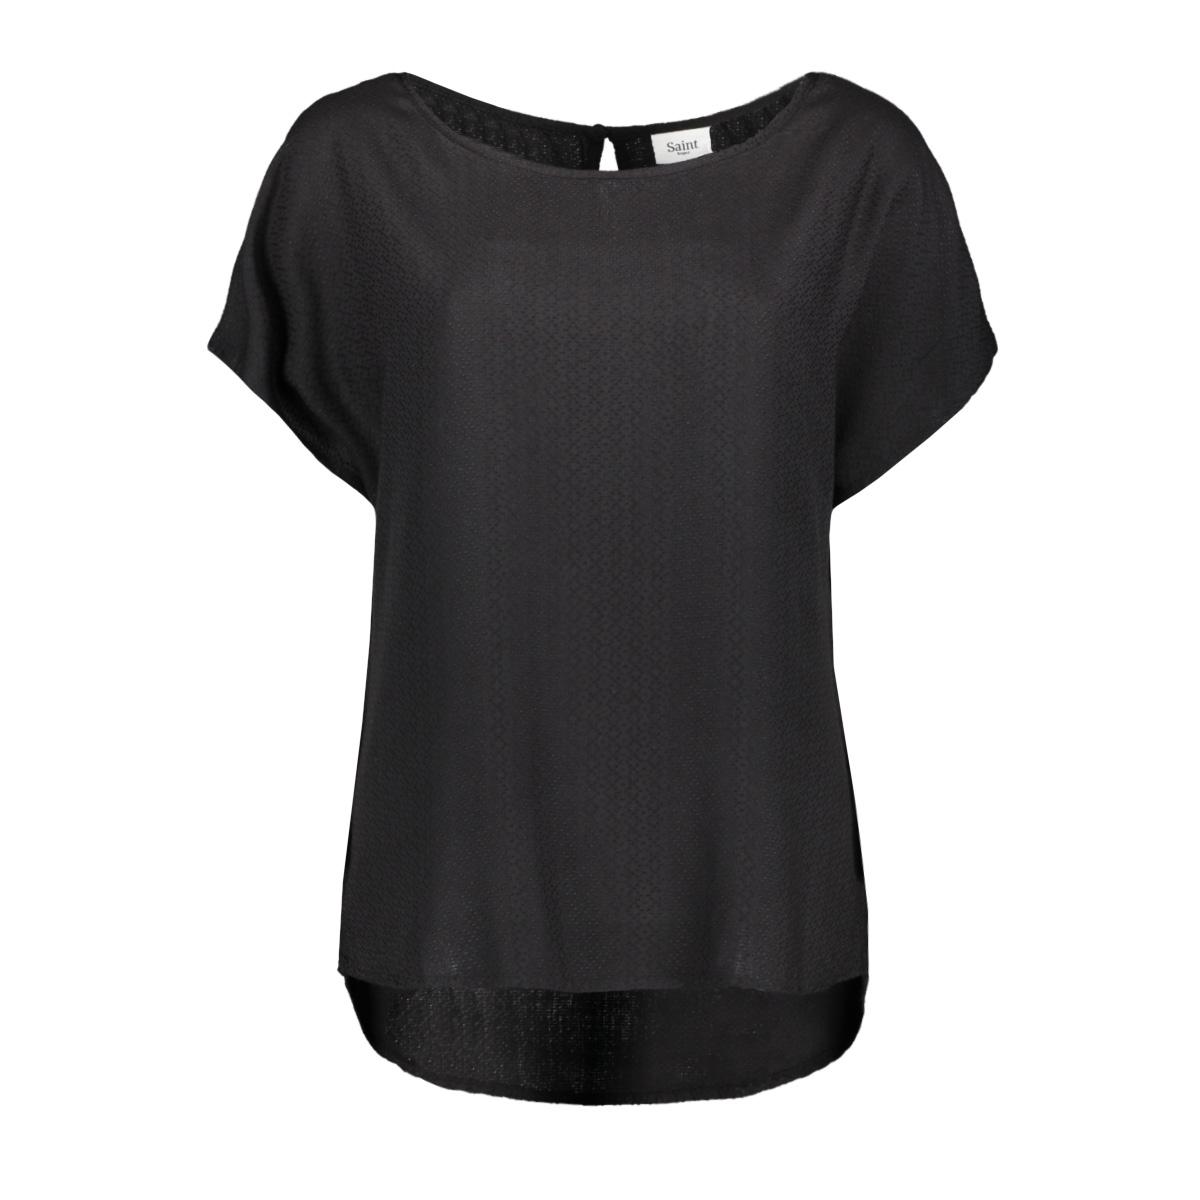 zwarte blouse u1045 saint tropez t-shirt 0001